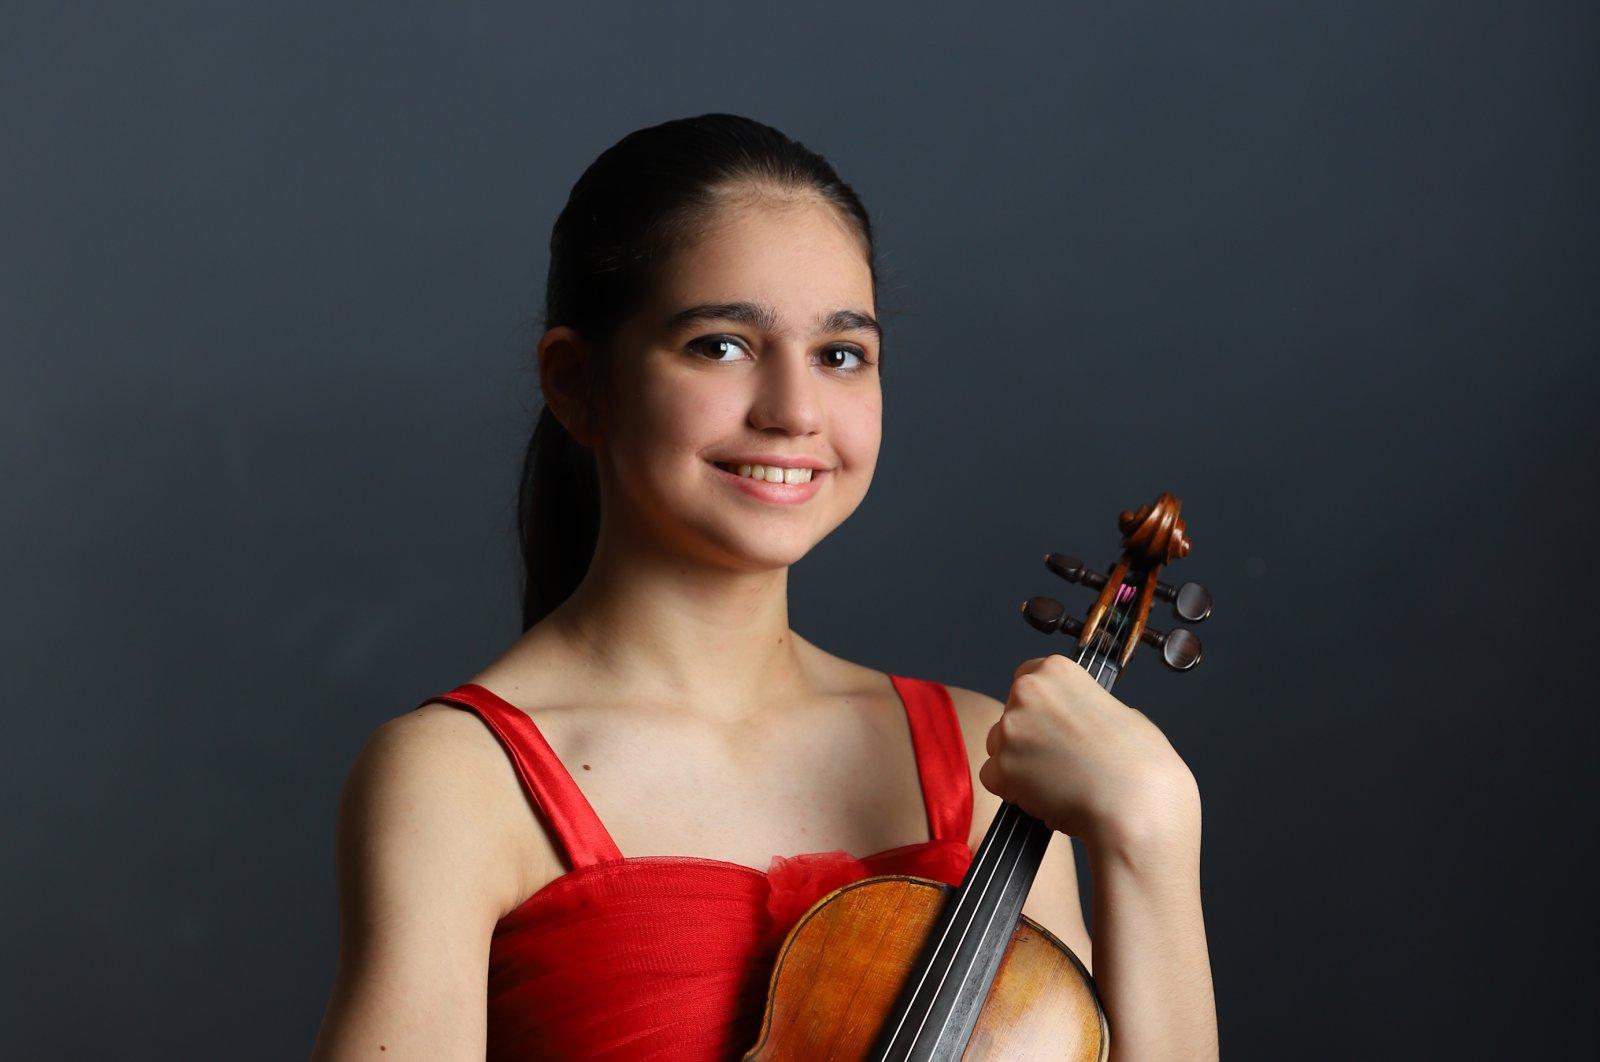 Naz Irem Türkmen started her musical journey when she was 7.